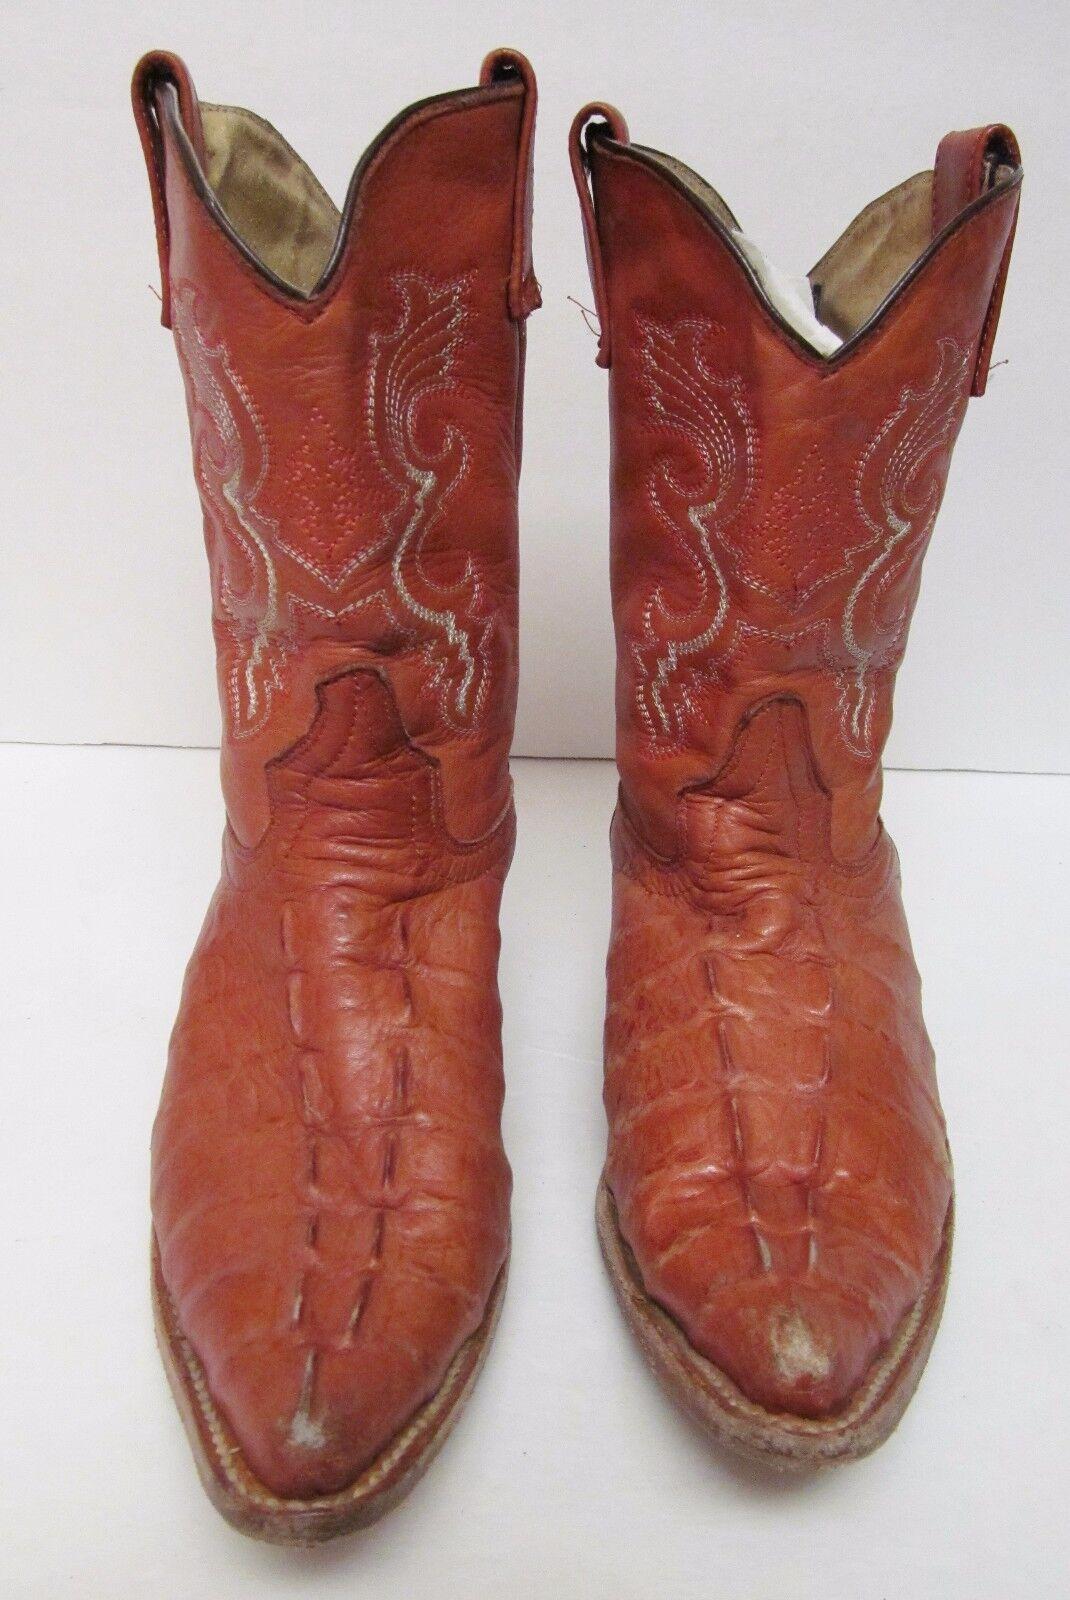 Figueroa Mexico Distress Crocodile Alligator Hornback Cowboy Boots Tan Tan Tan 5 VTG 26f5a8